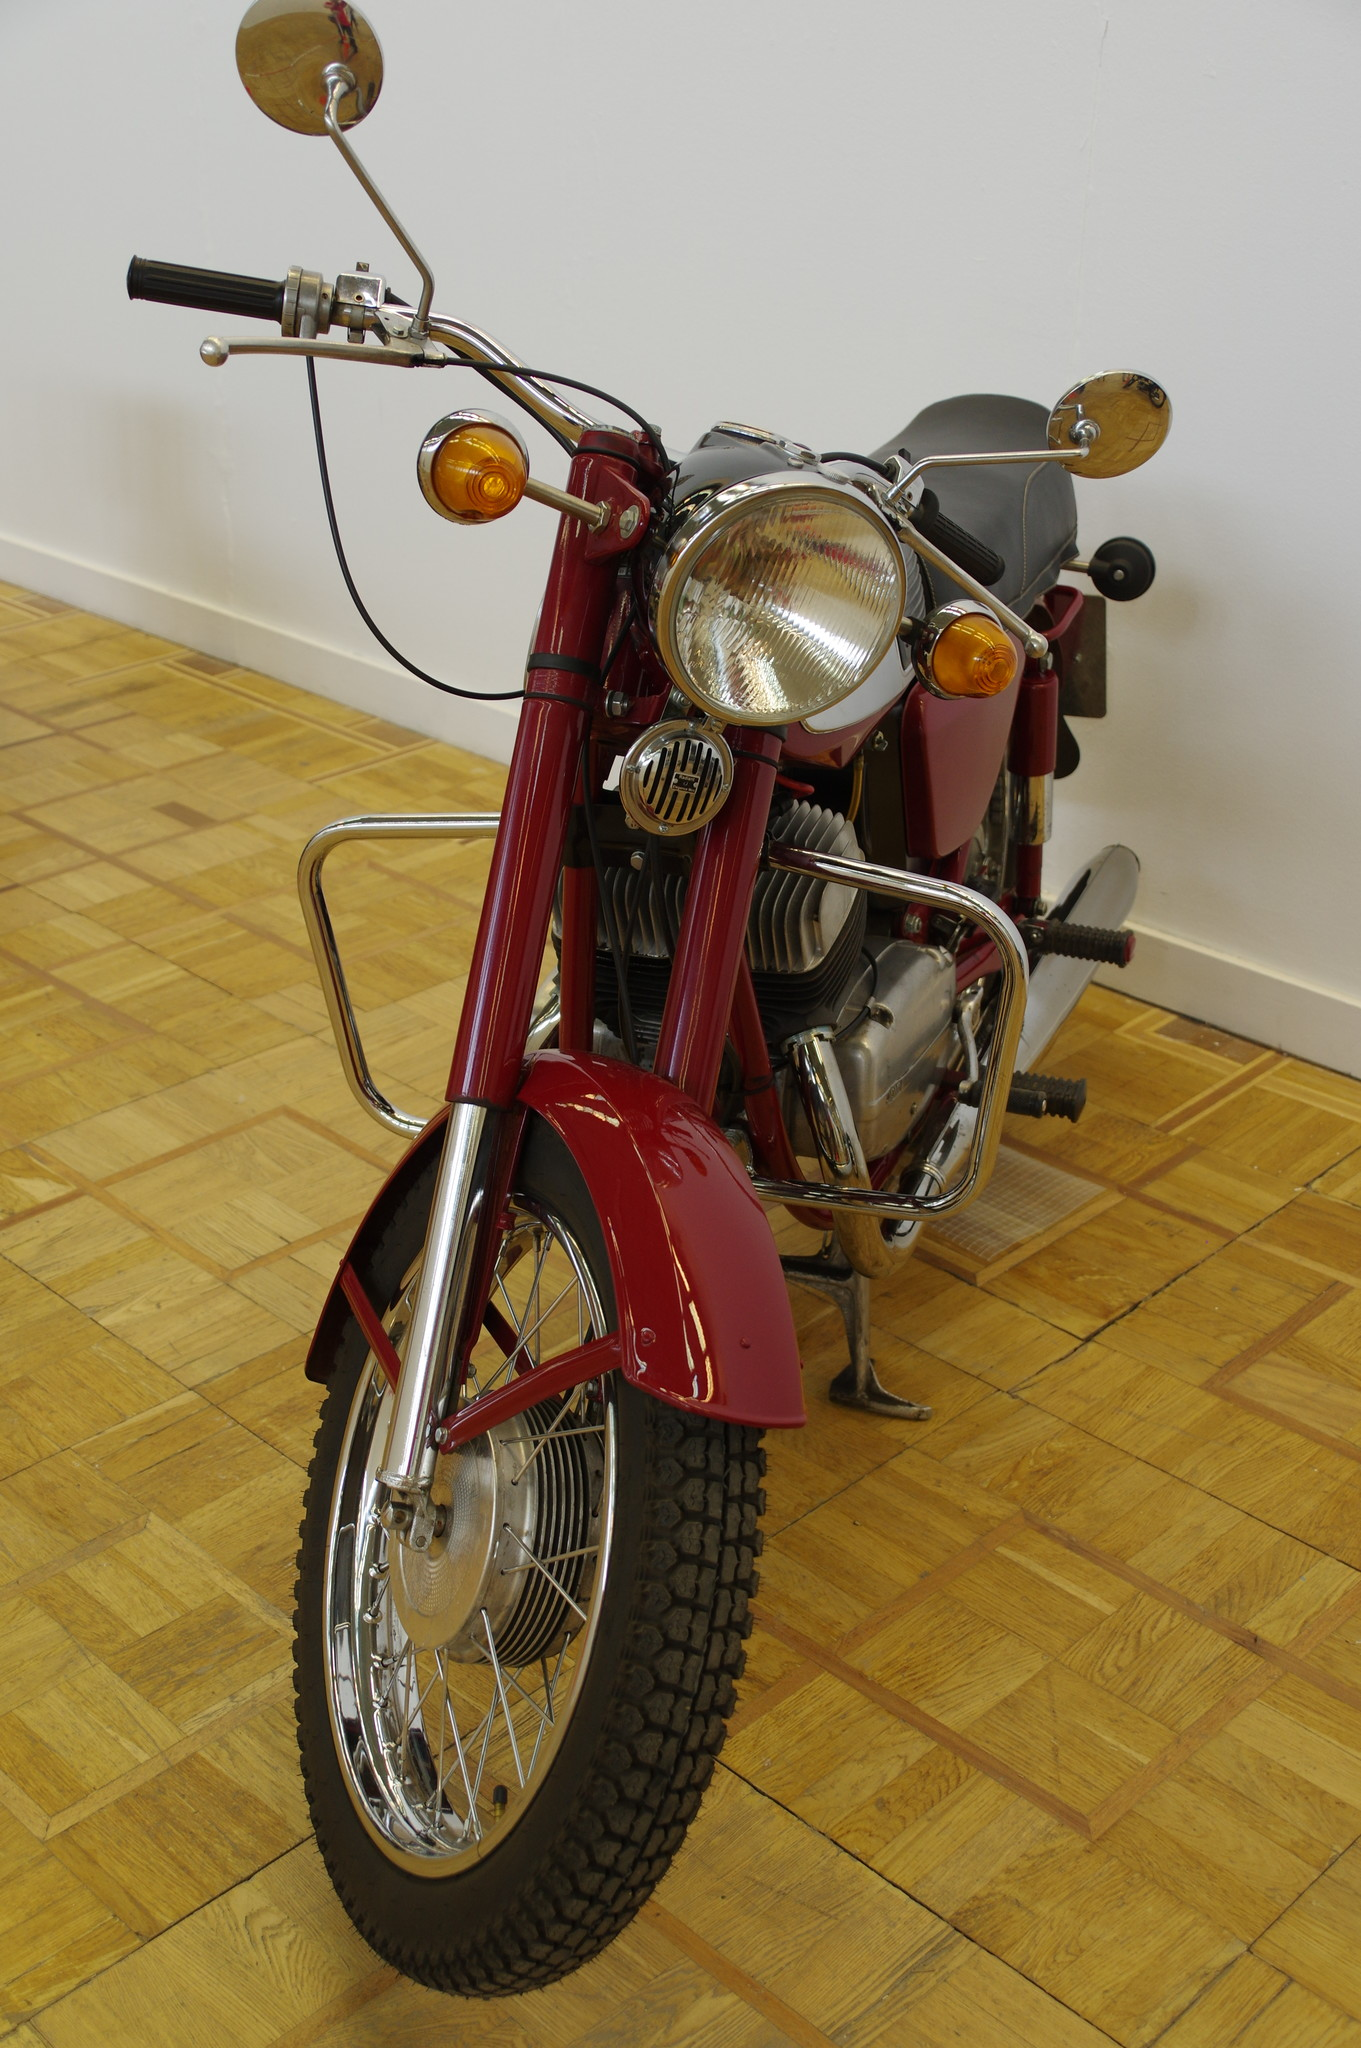 Мотоцикл Ява 350 634-01